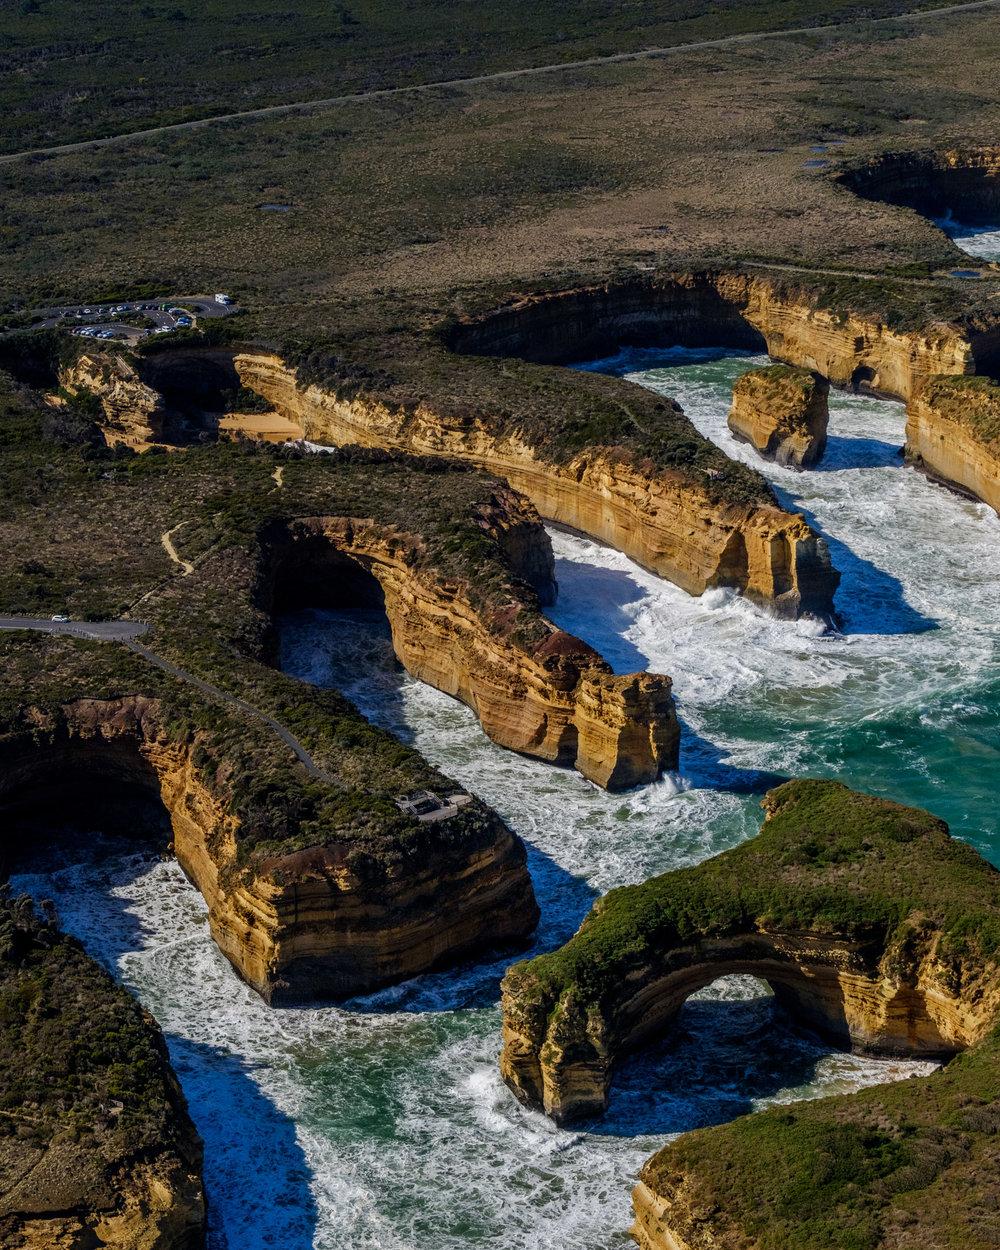 12-apostles-photography-workshop-great-ocean-road-04